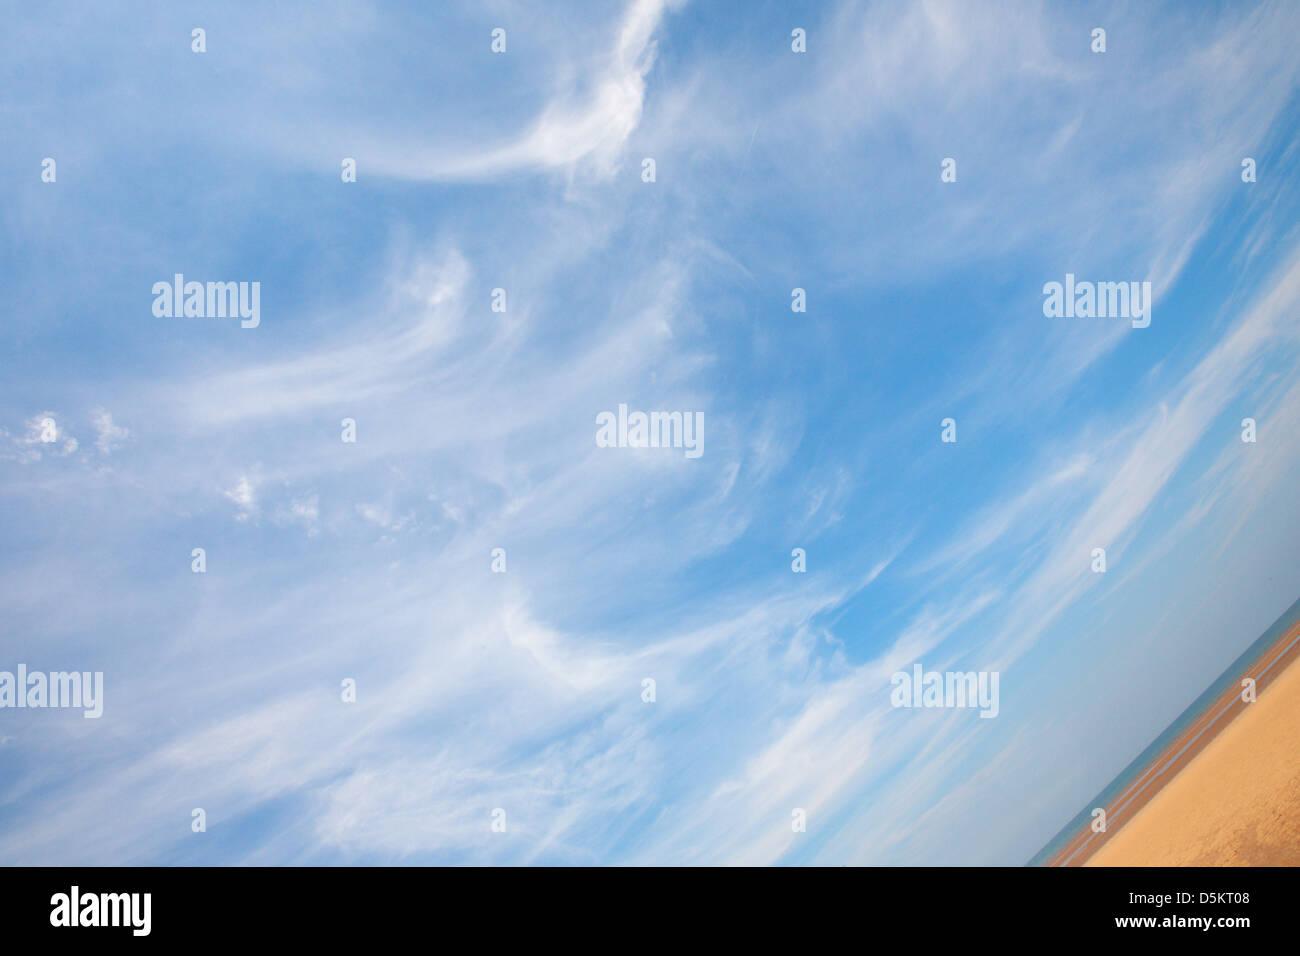 UK; NORFOLK; THORNHAM; SAND; SKY; ANGLE; BEACH; CLOUDS; DIAGONAL - Stock Image